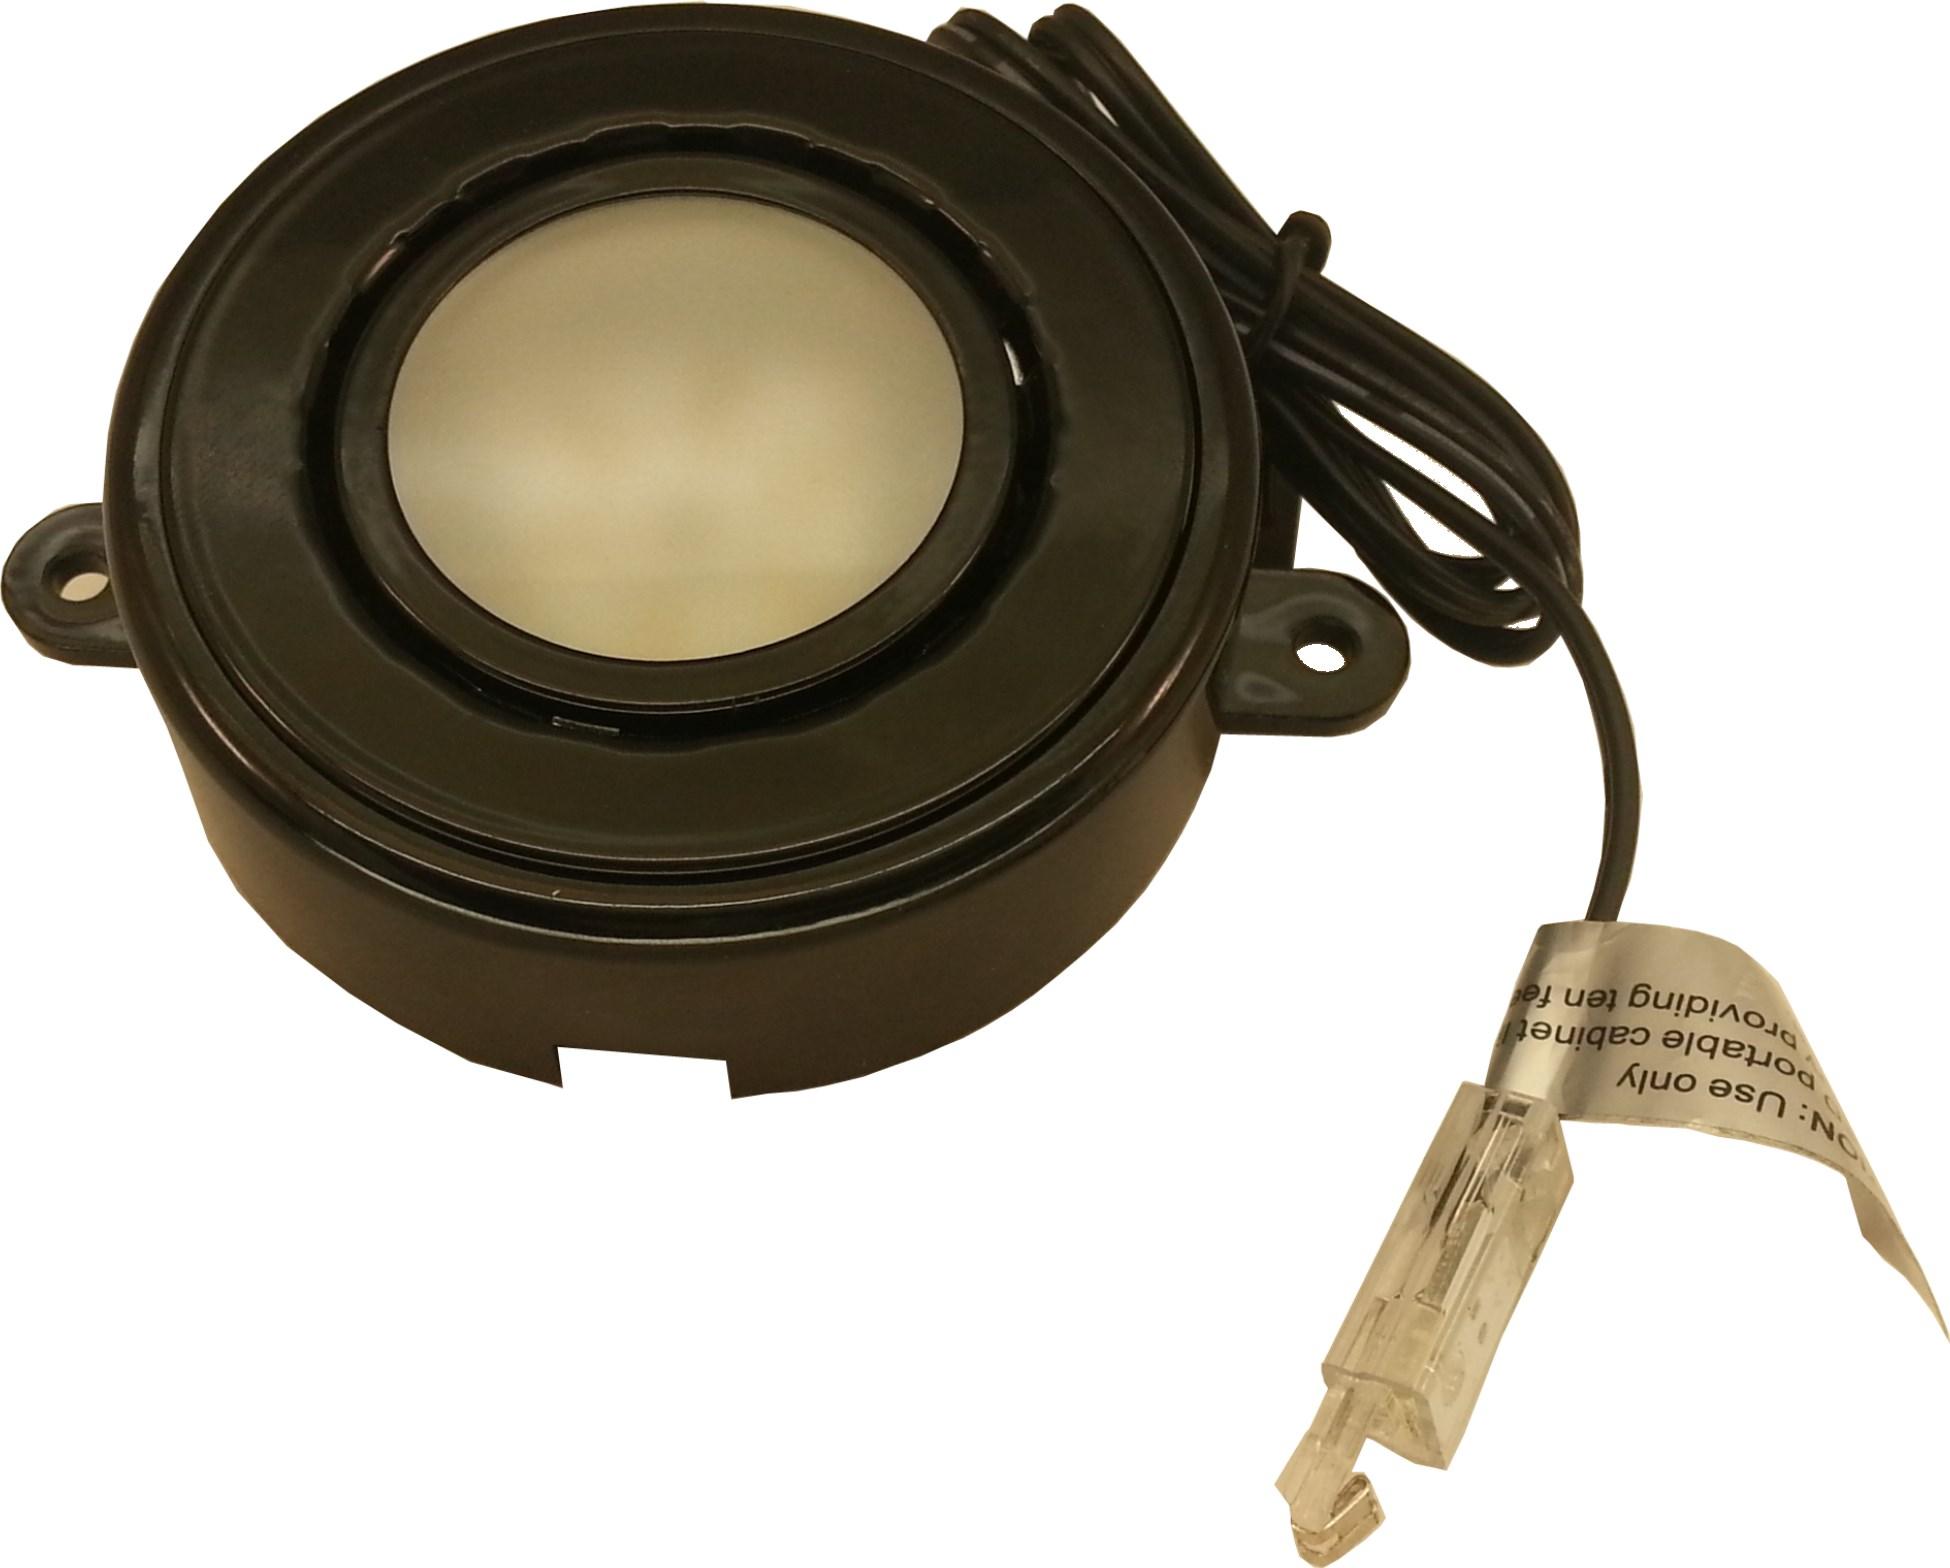 Fc 493 Bk Single Lead Led Puck Light 3 1 4 Quot Diameter